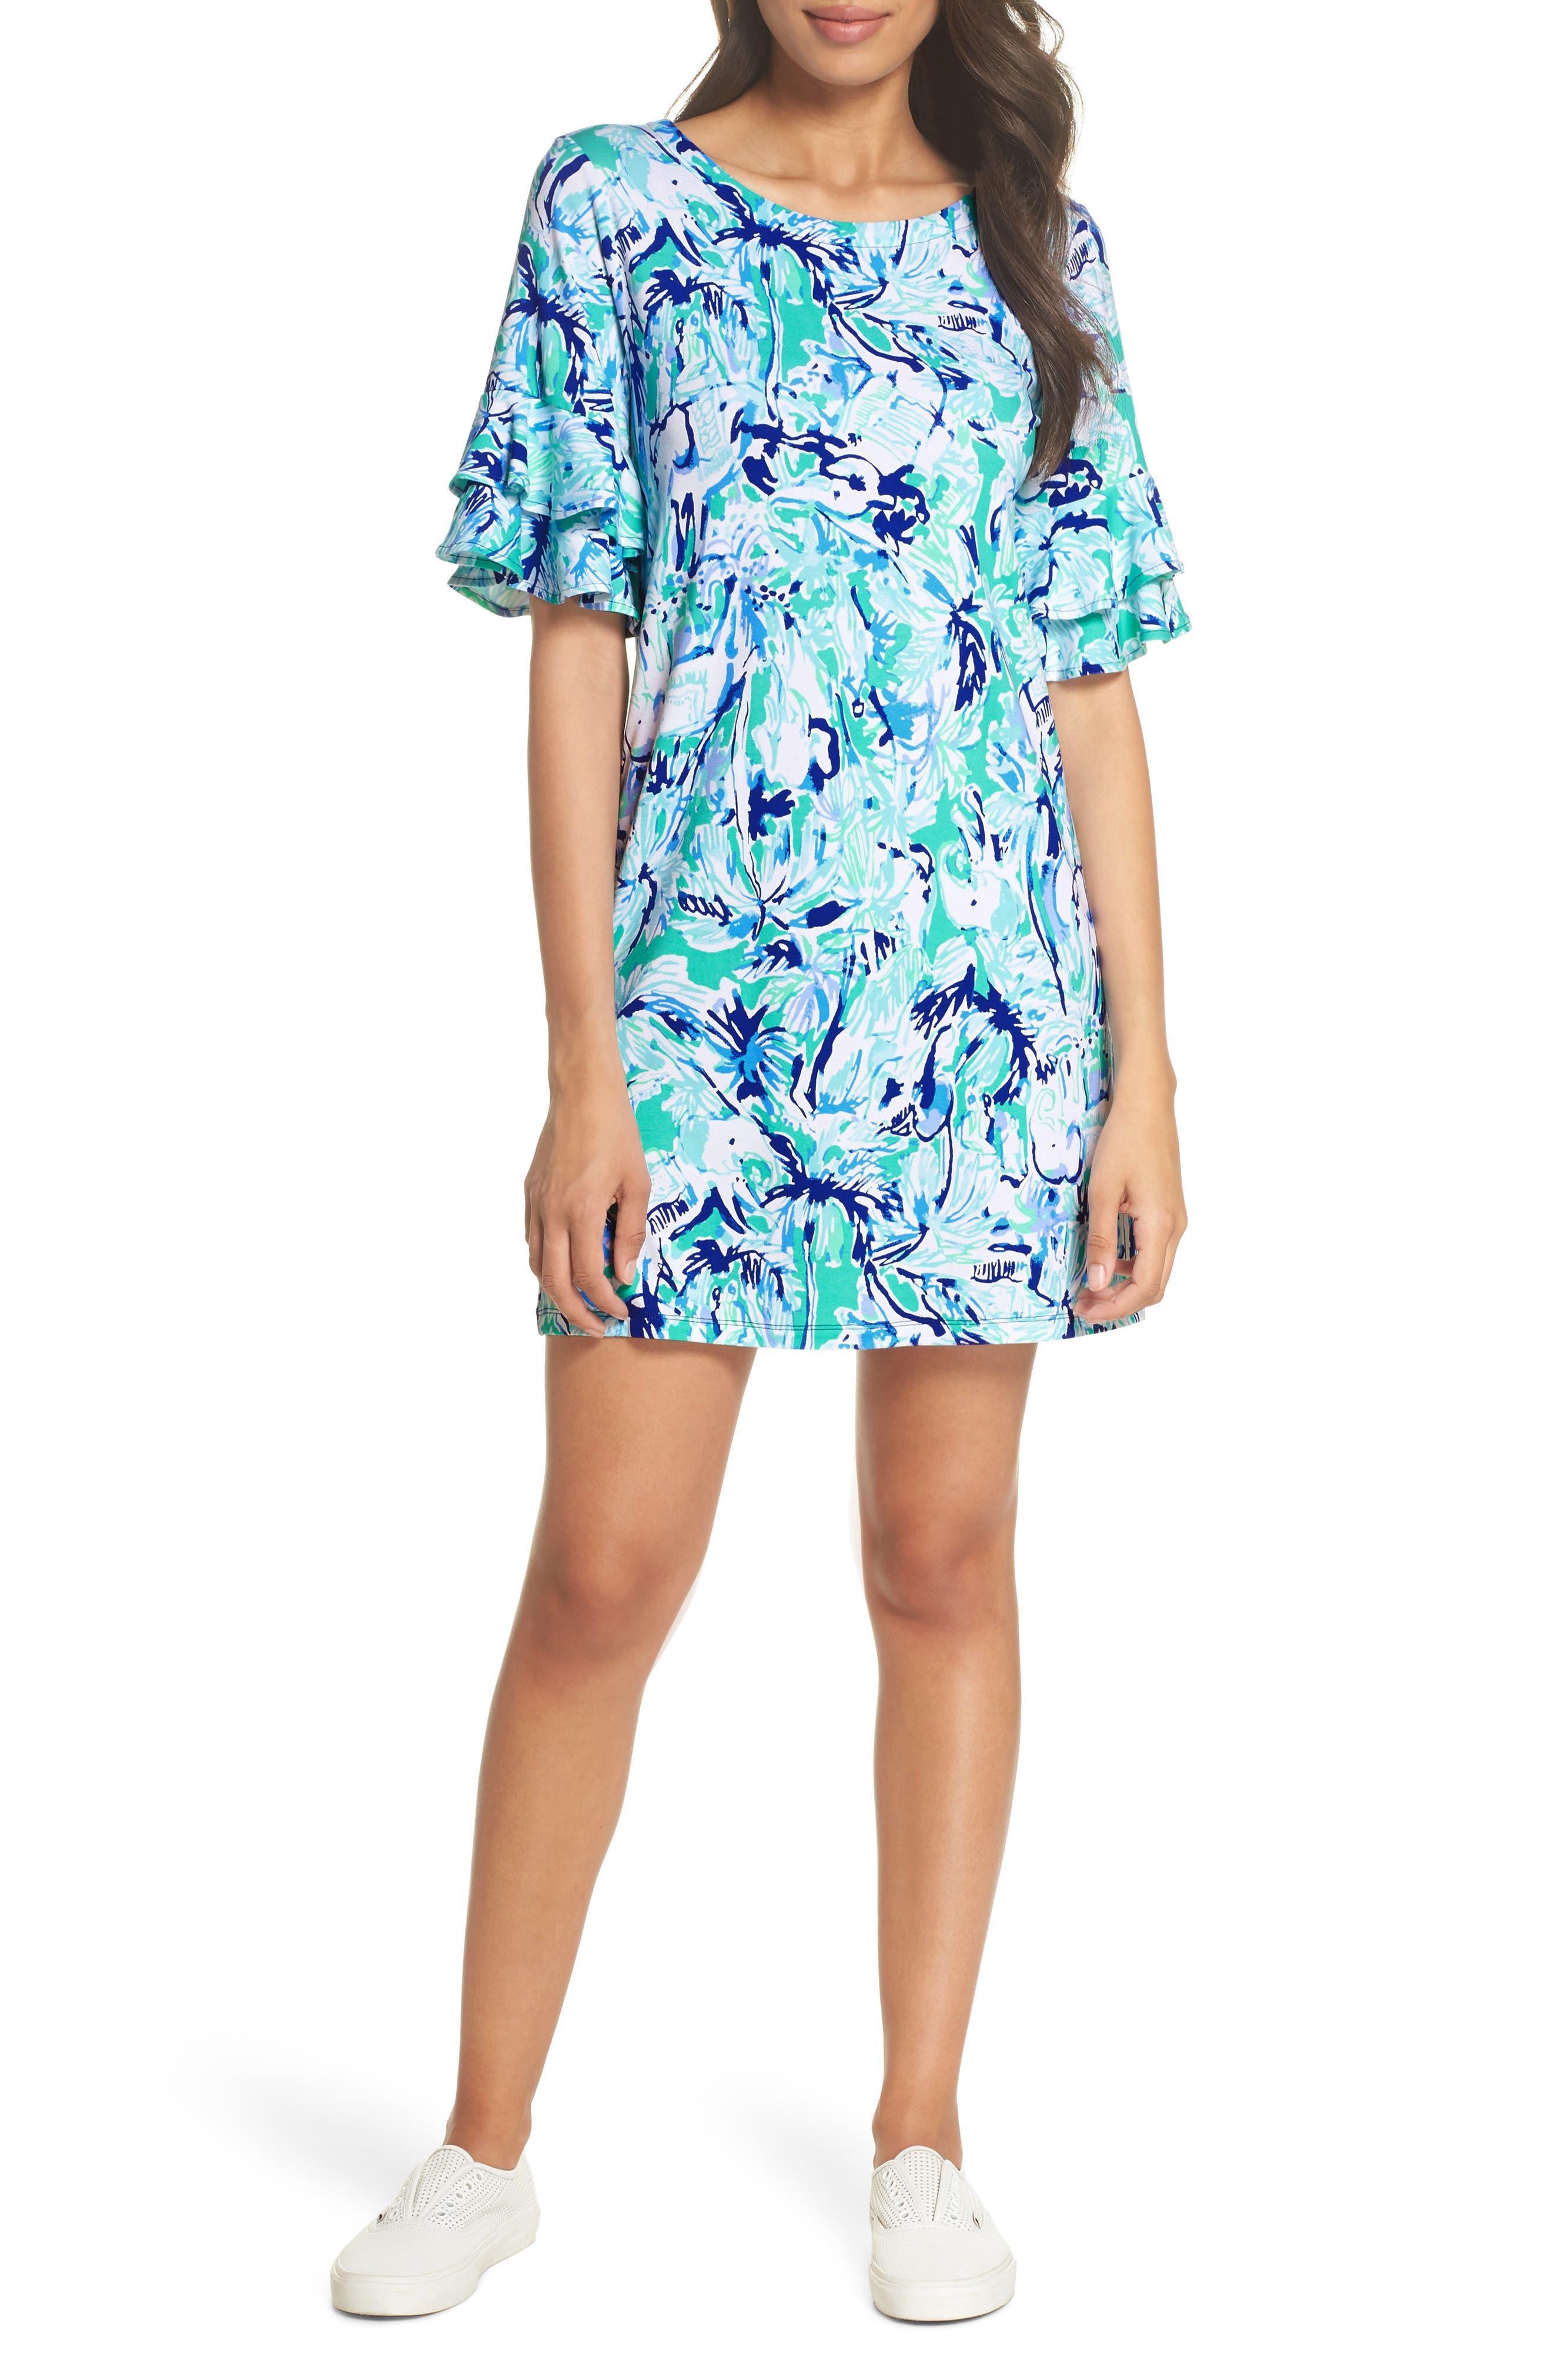 LILLY PULITZER<SUP>®</SUP> Lula Ruffle Sleeve Dress, Main, color, 421